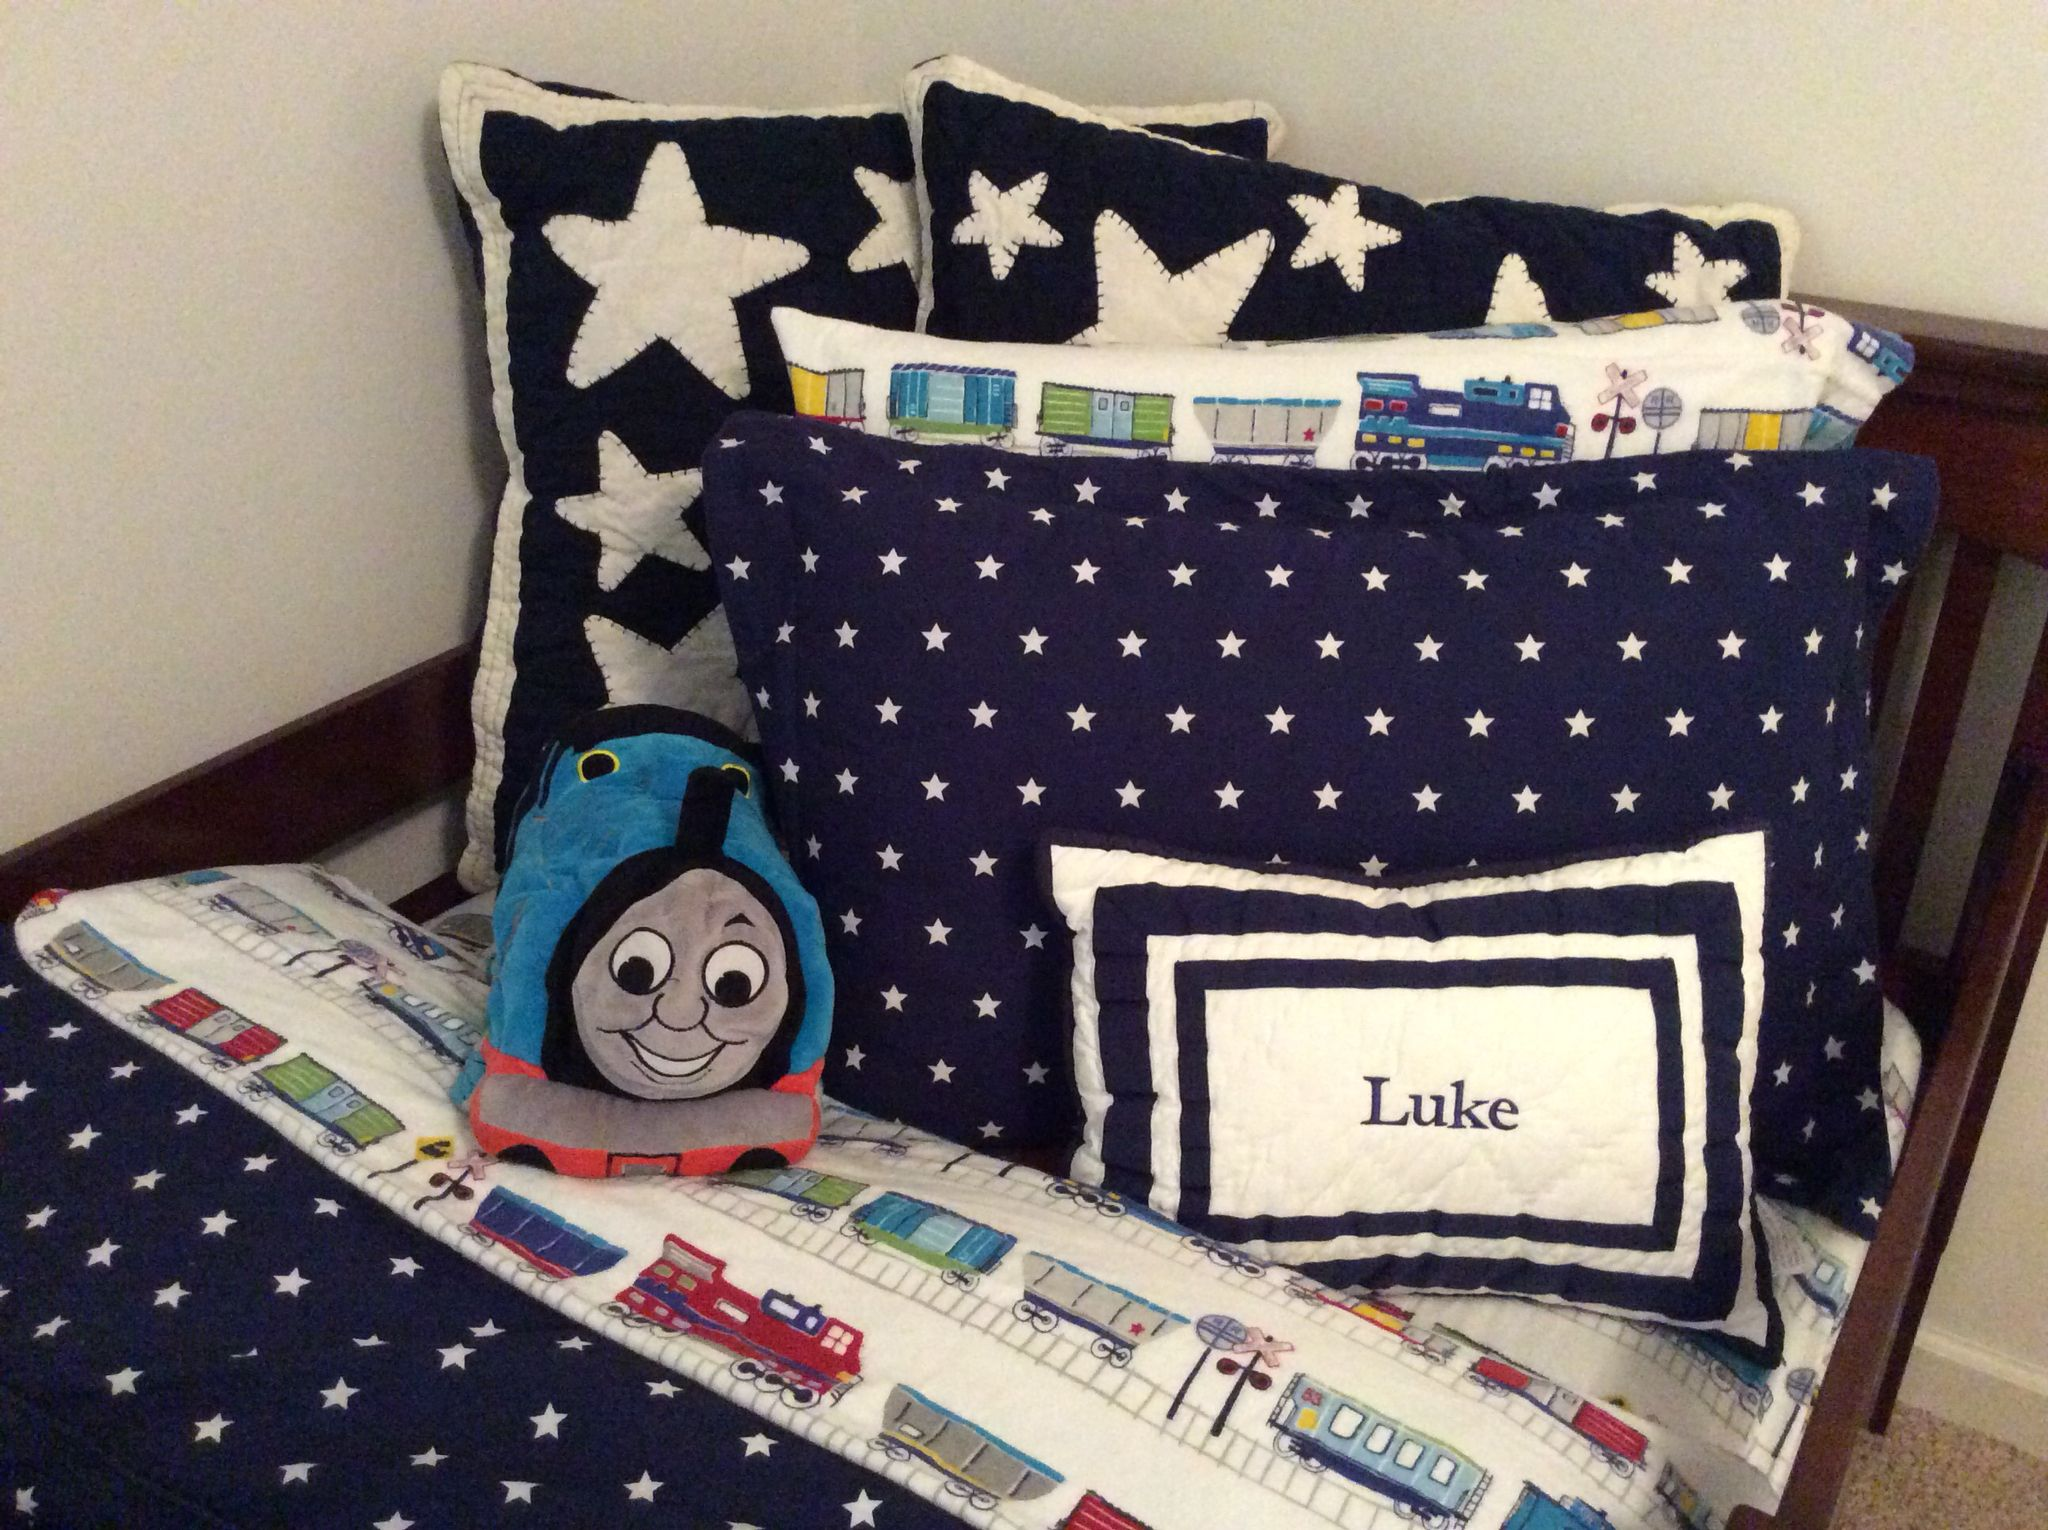 Toddler Train Room, Pottery Barn Kids Trains, Train Table, Thomas The The  Train